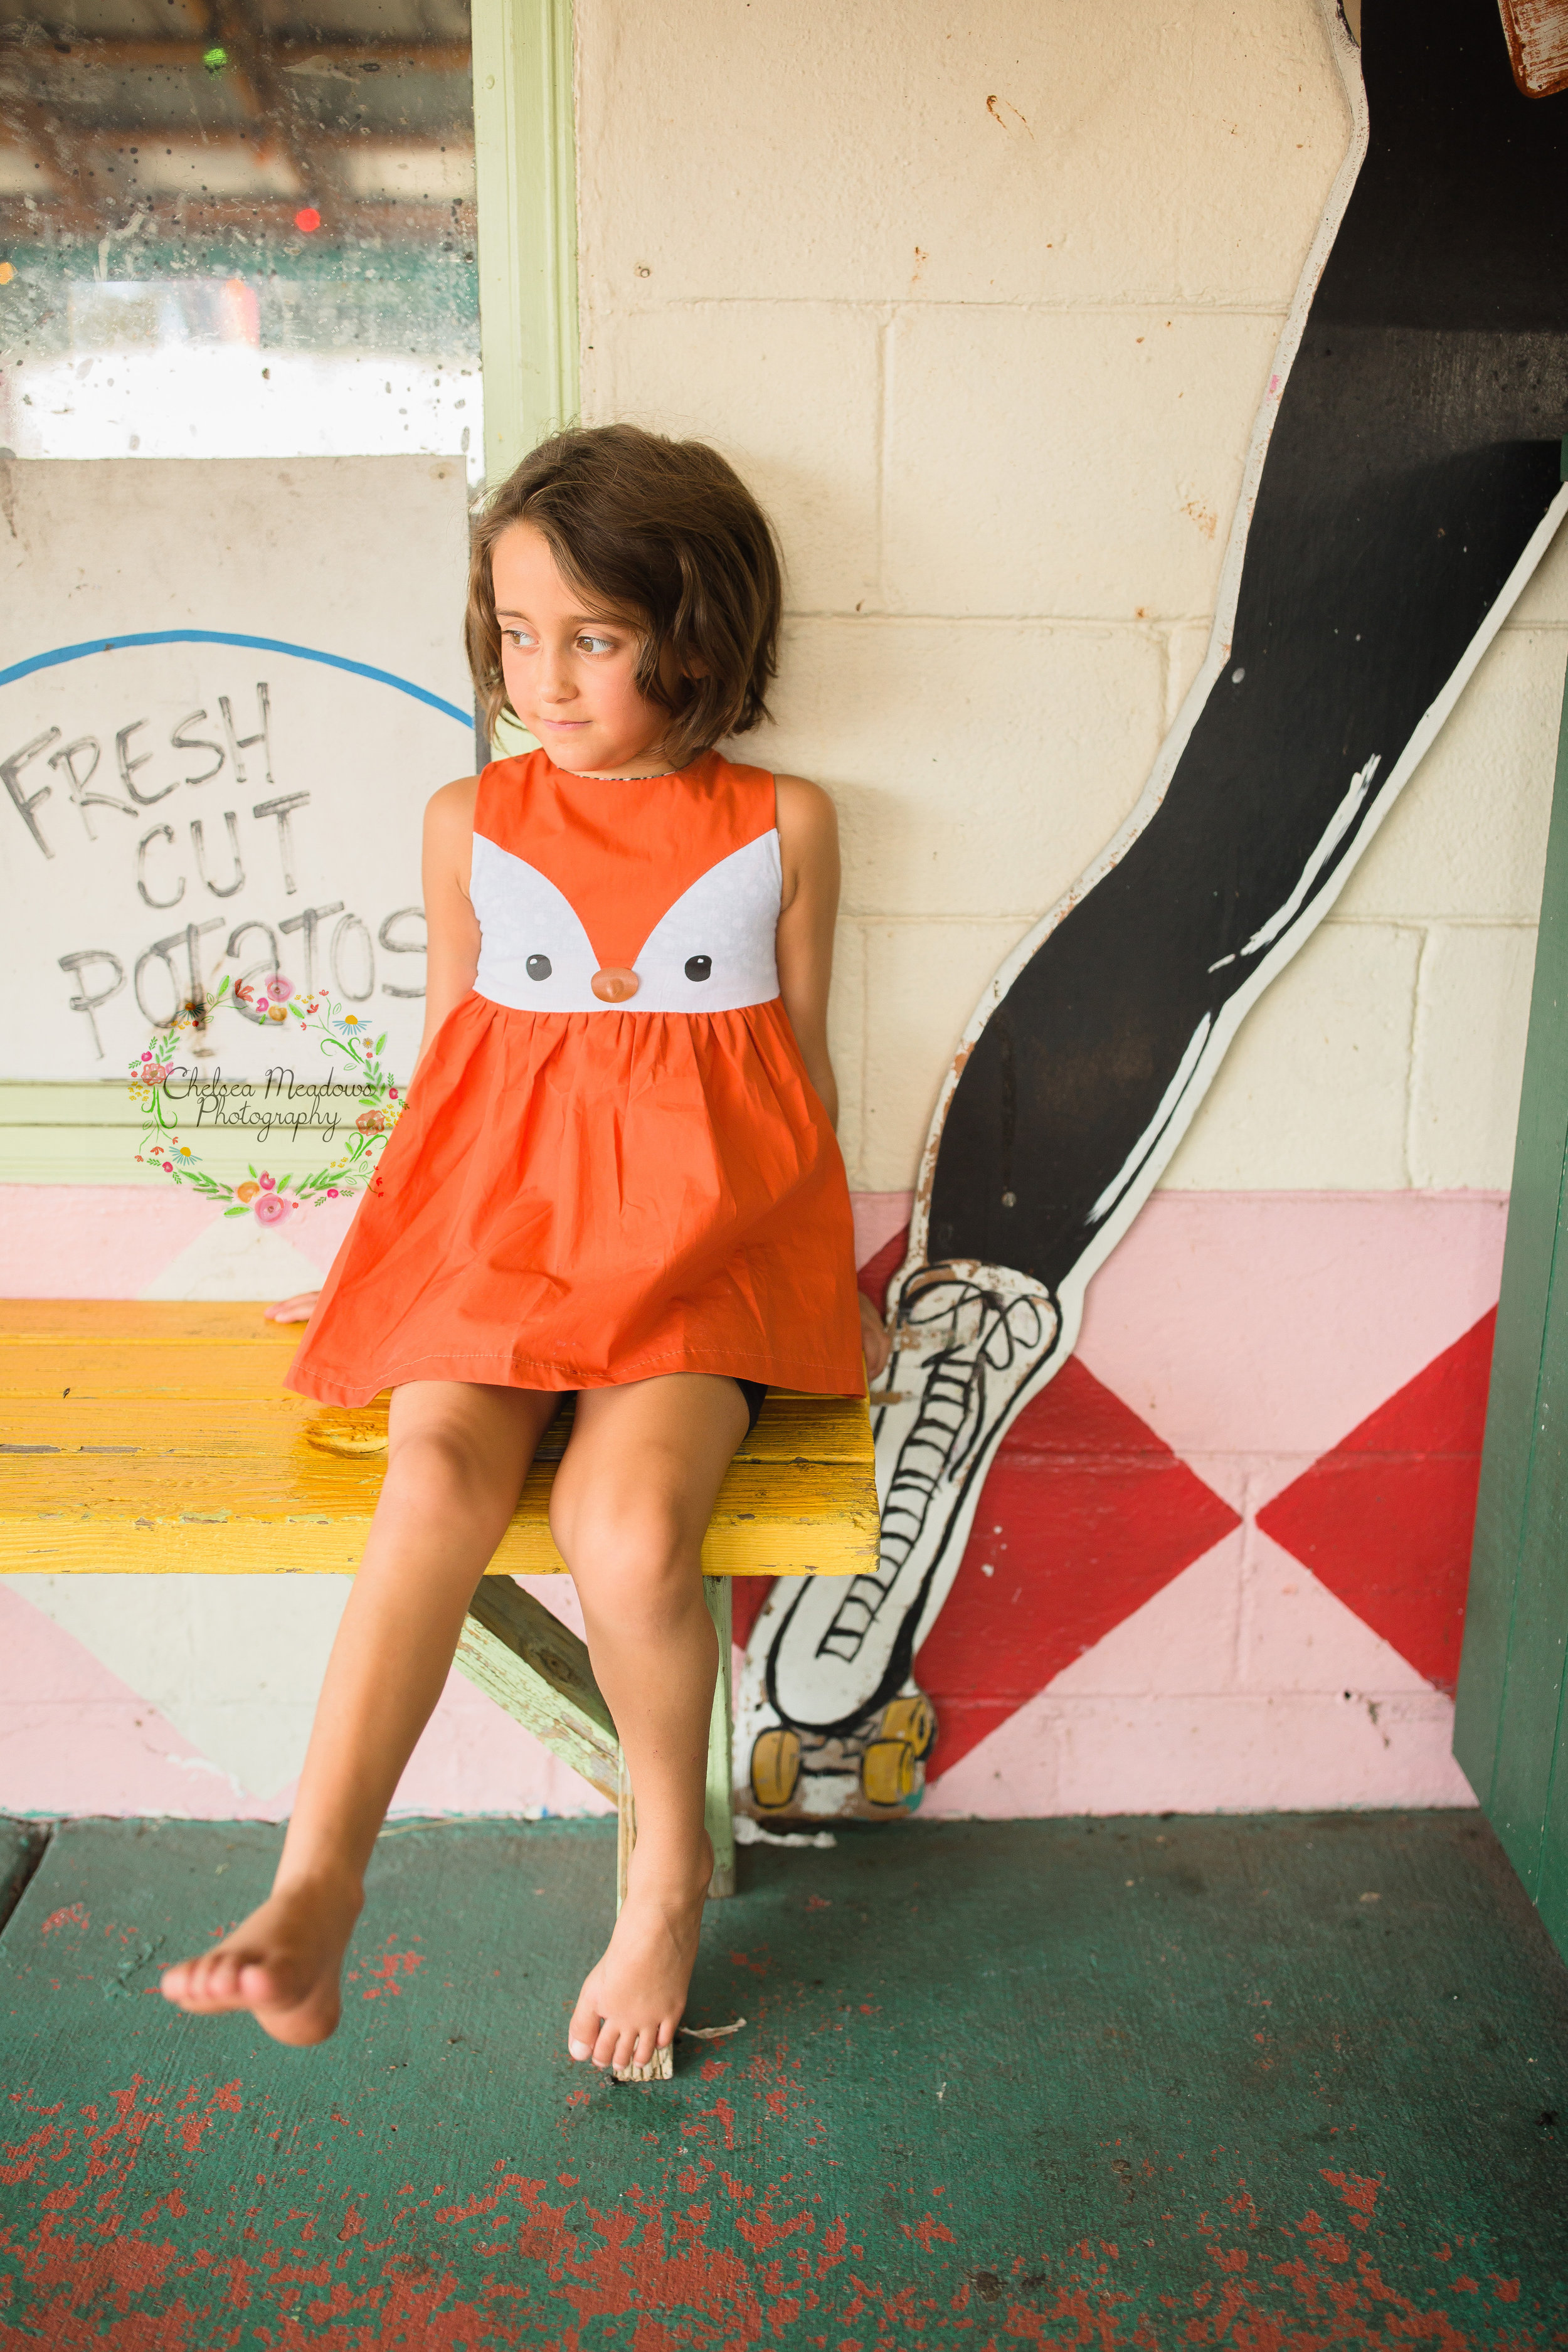 Izzy Family Photoshoot - Nashville Family Photographer - Chelsea Meadows Photography (32).jpg